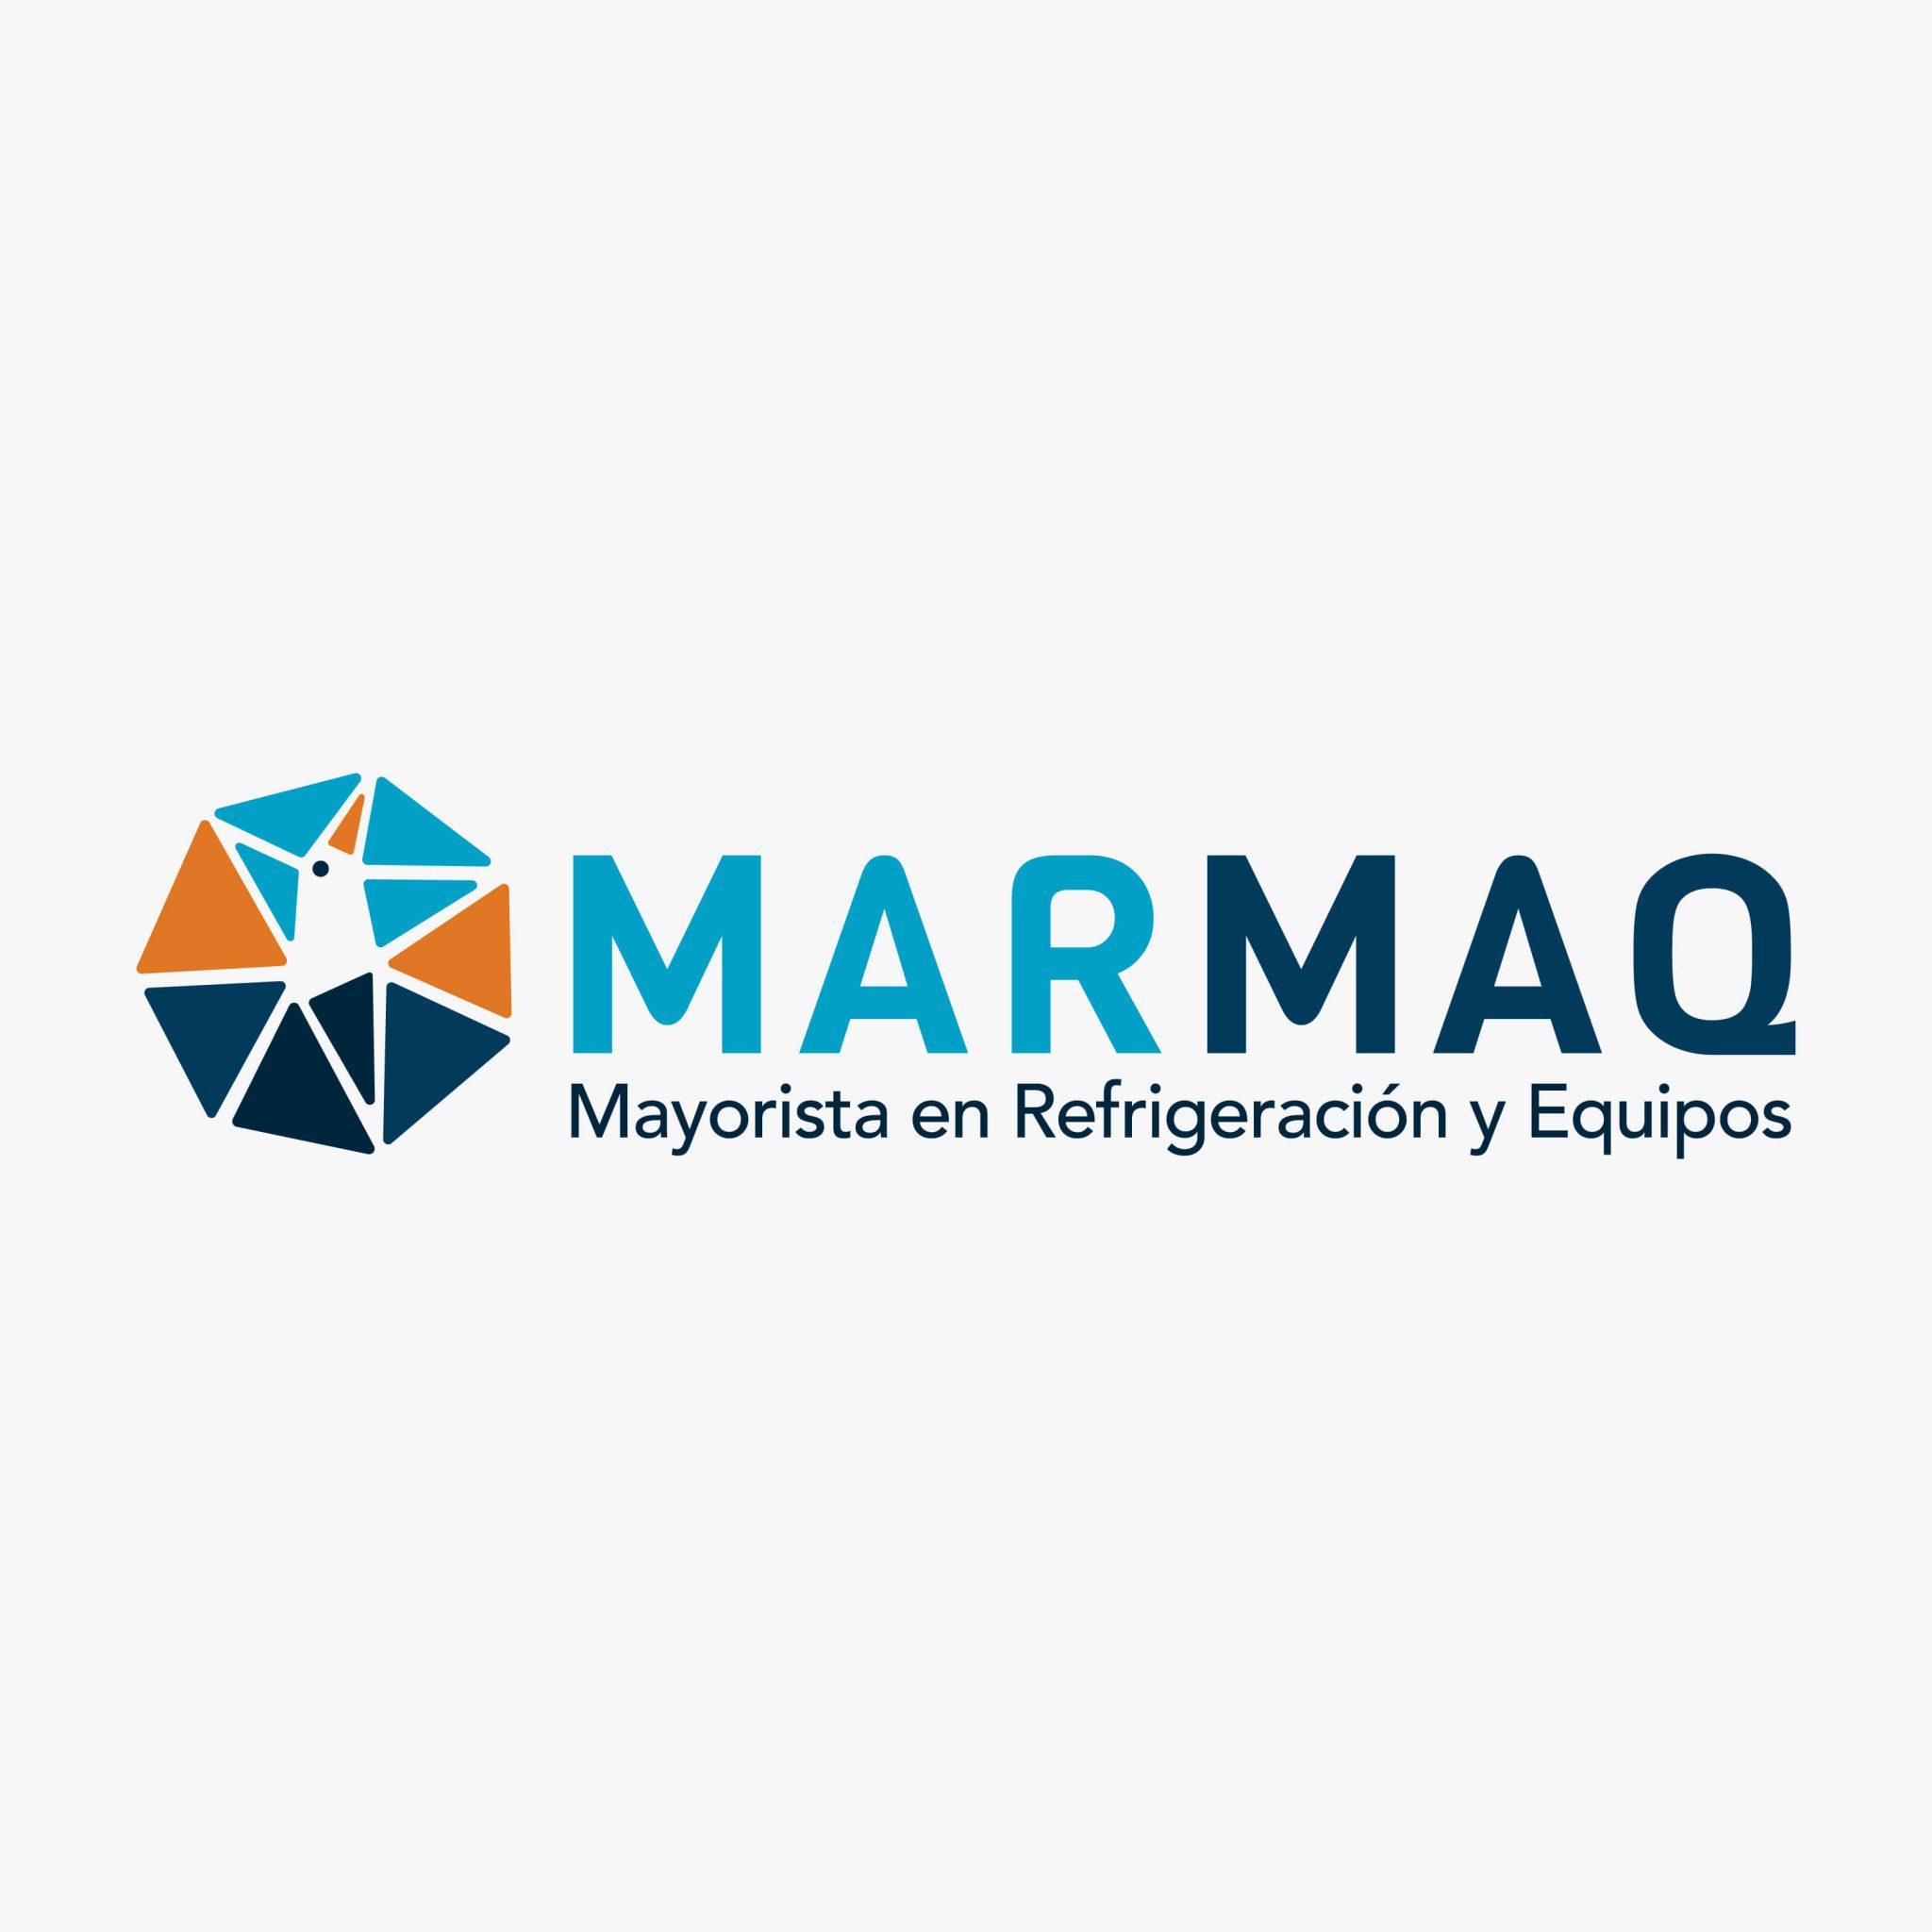 agencia-de-manejo-de-redes-sociales-colateral-Marmaq-rrss-1